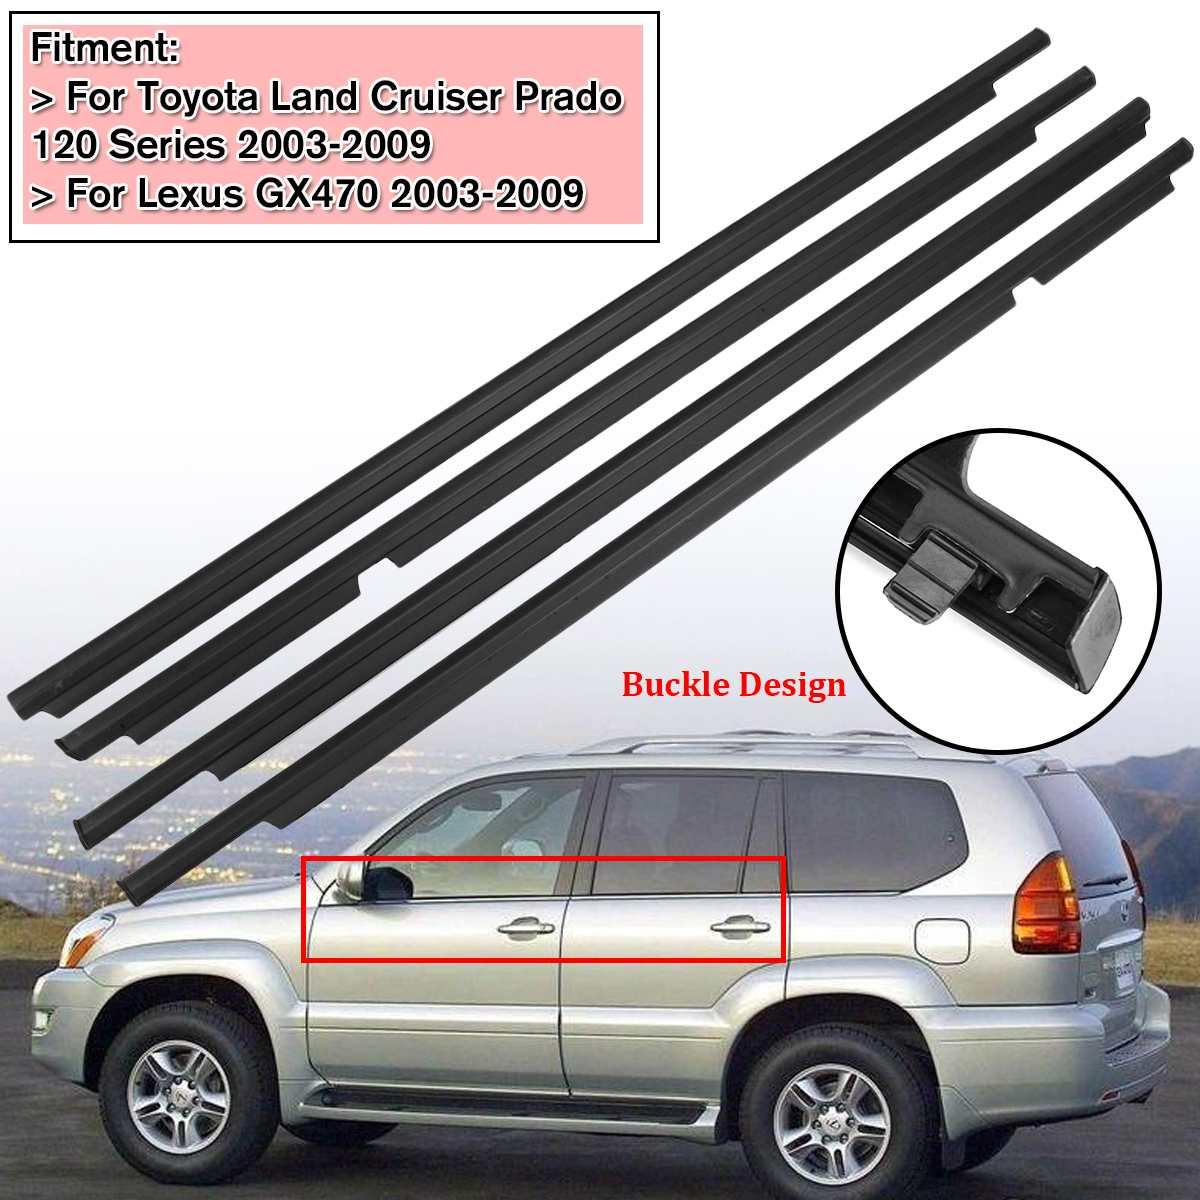 NEW 4Pcs Weatherstrips Door Belts Seal Weather Strips For Toyota Land Cruiser 120 Prado 2003-2009 For Lexus GX470  2003-2009